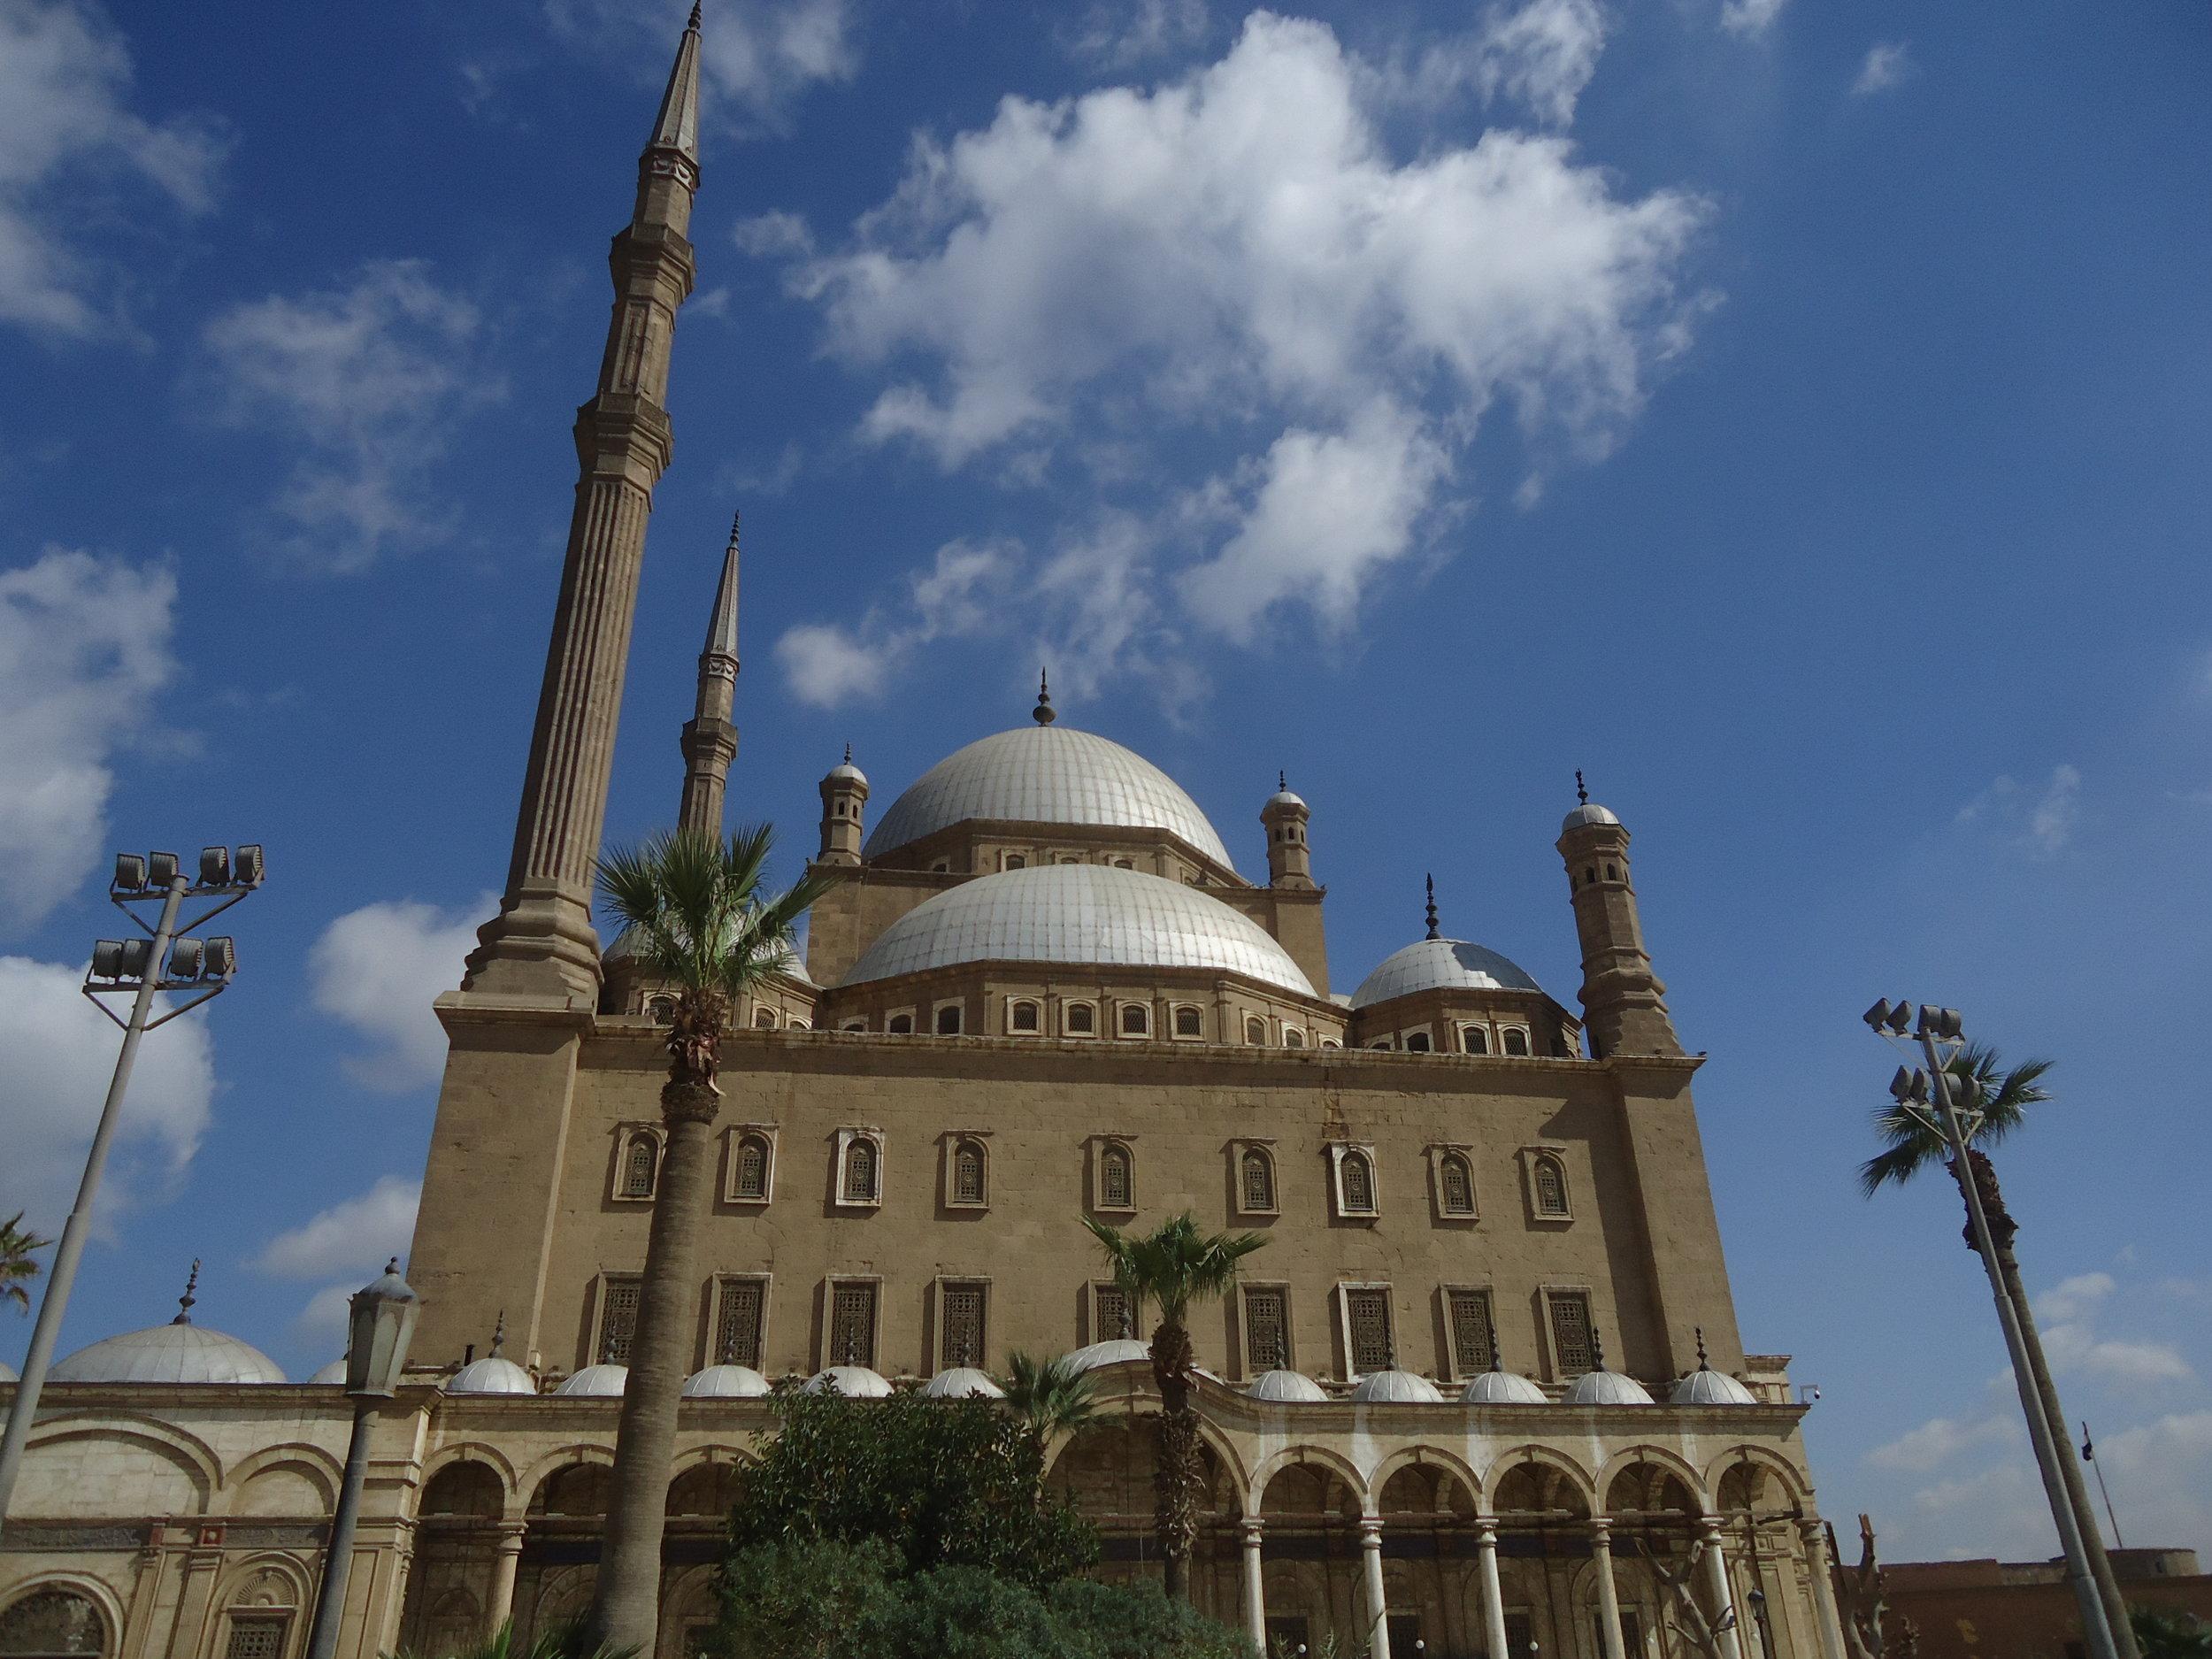 The Saladin Citadel of Cairo.